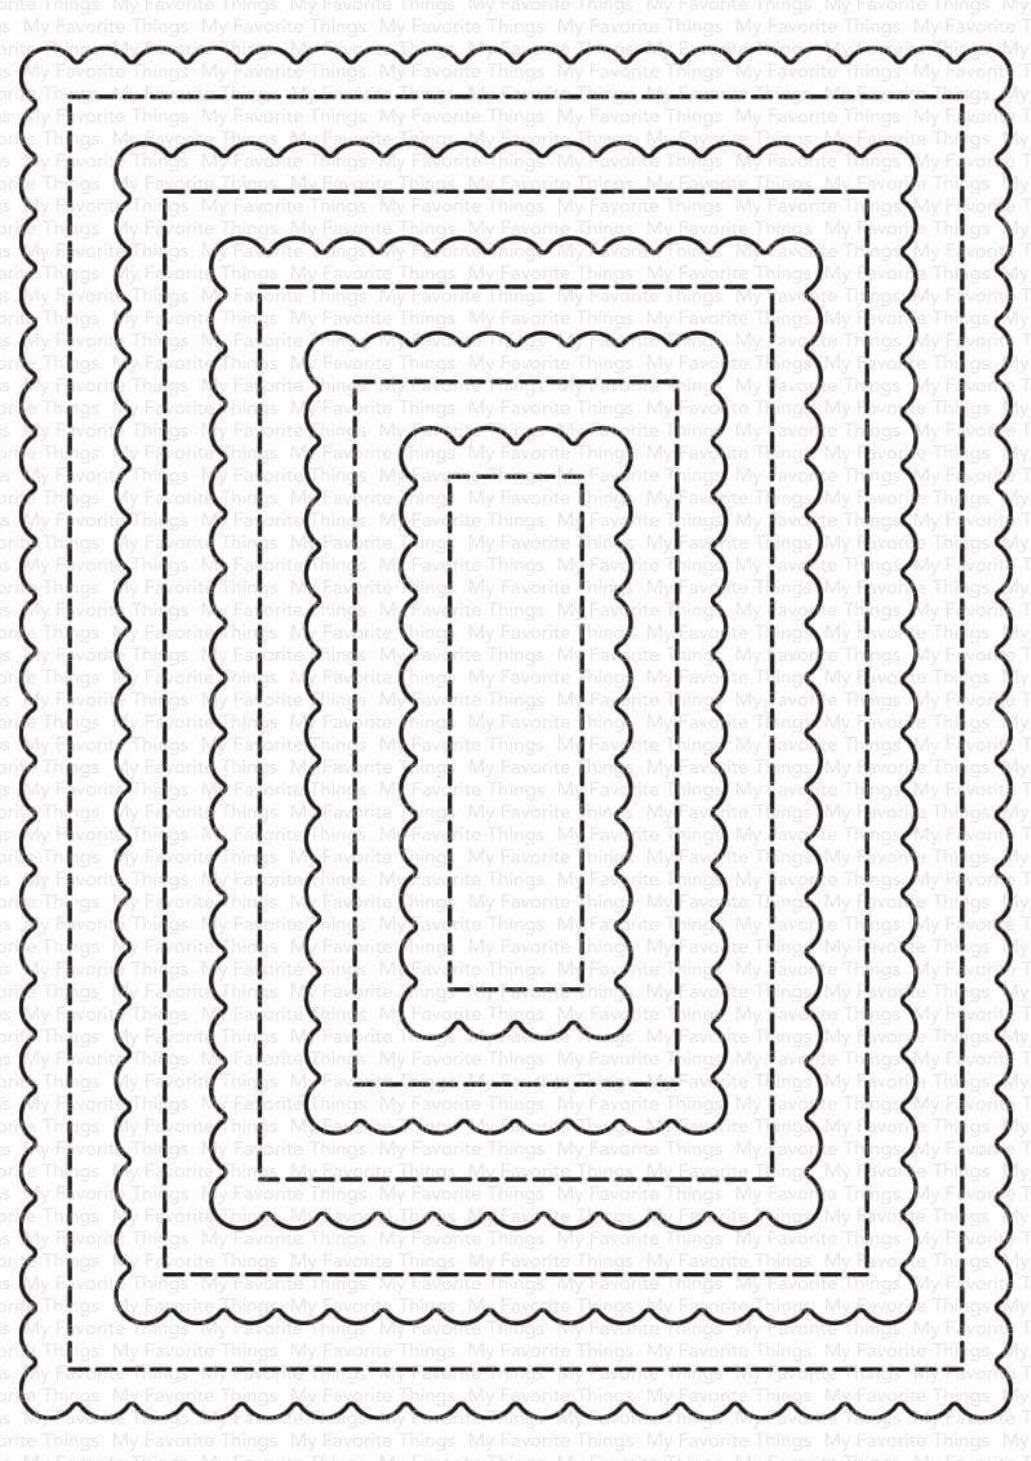 MFT - Stitched Mini Scallop Rectangle STAX Die